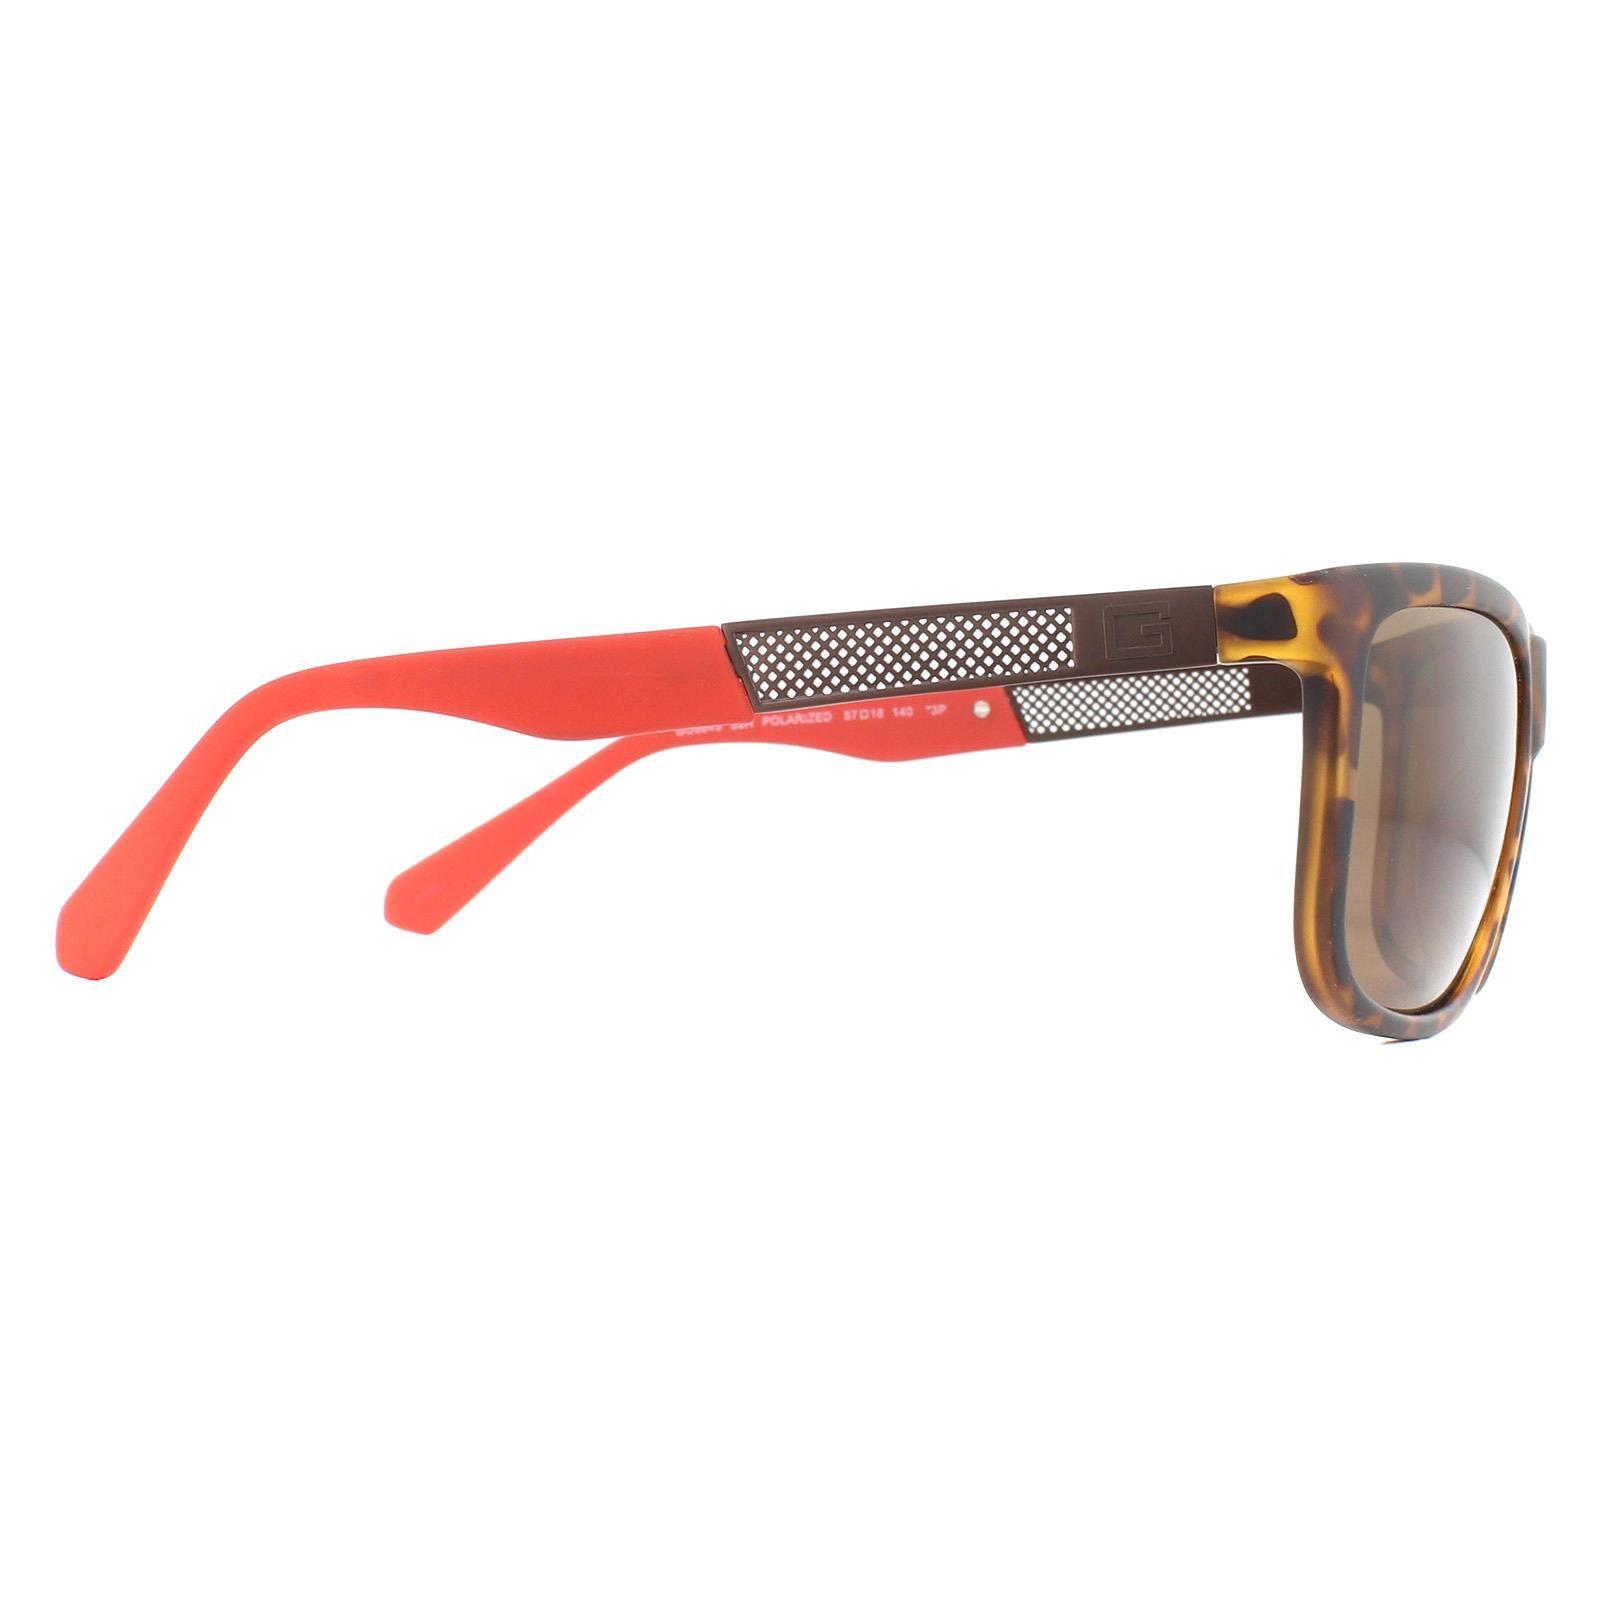 Guess Sunglasses GU6843 52H Dark Havana Brown Polarized